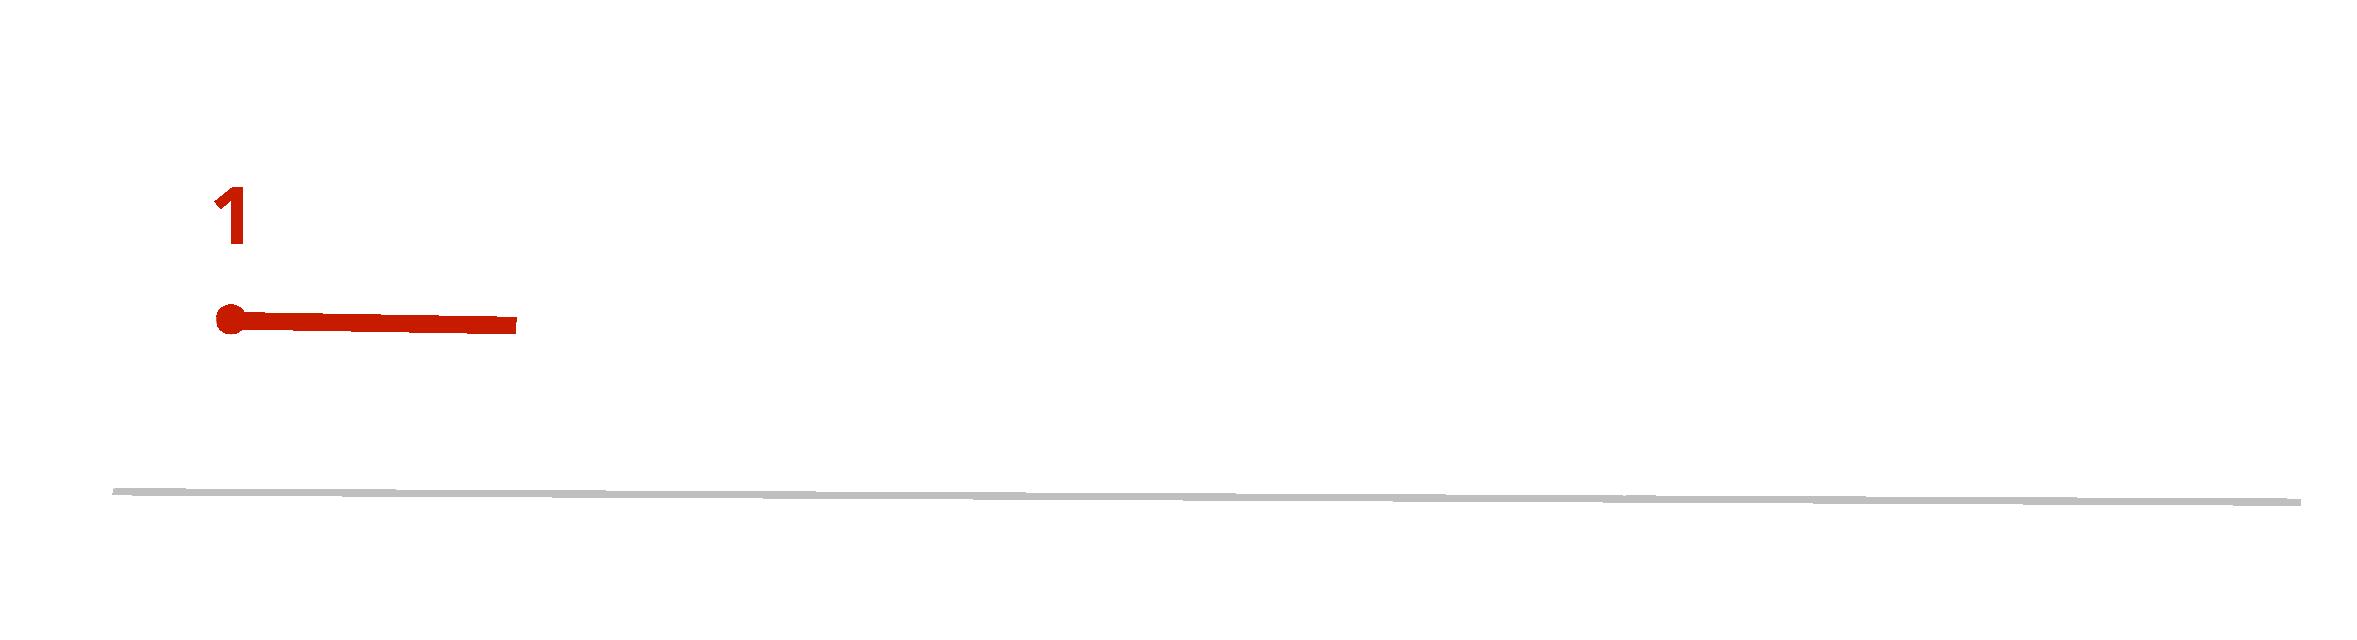 Beginner track in details